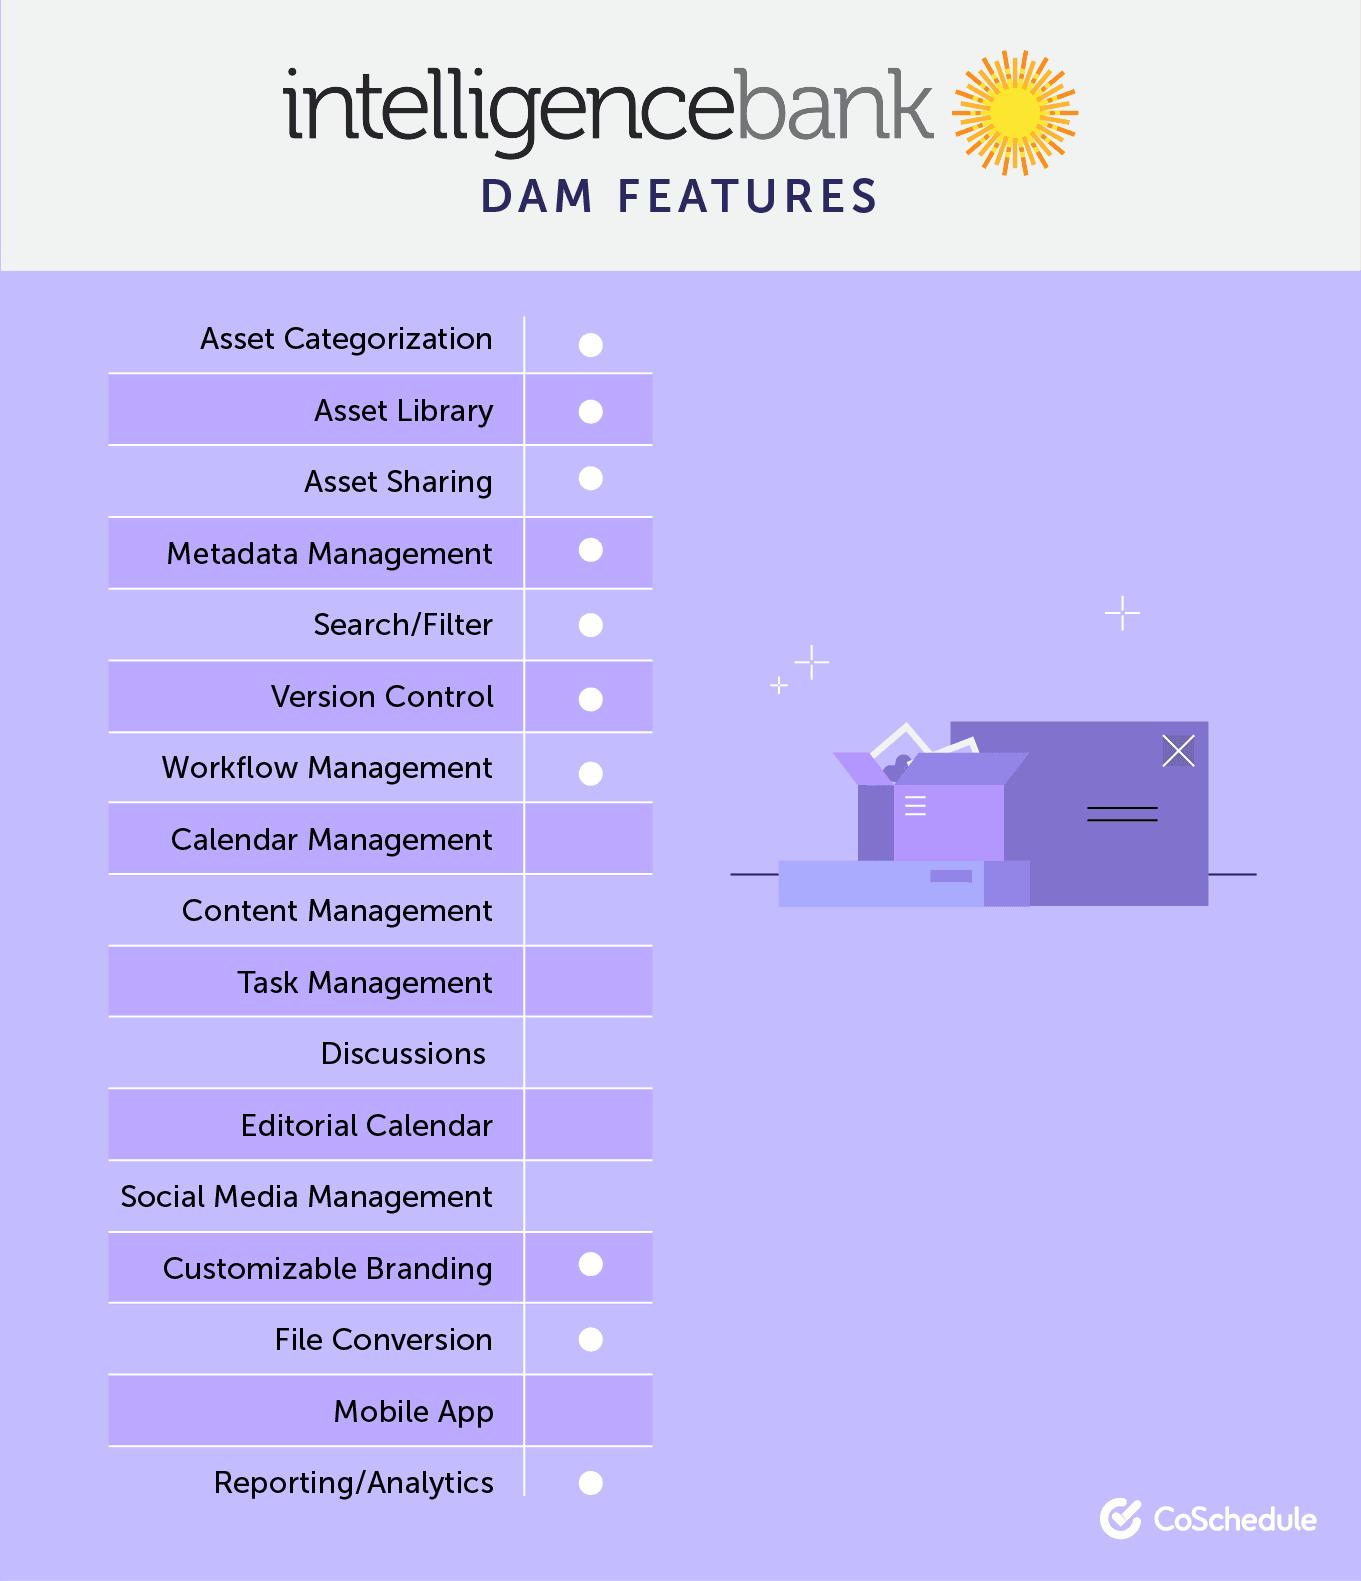 IntelligenceBank DAM Features